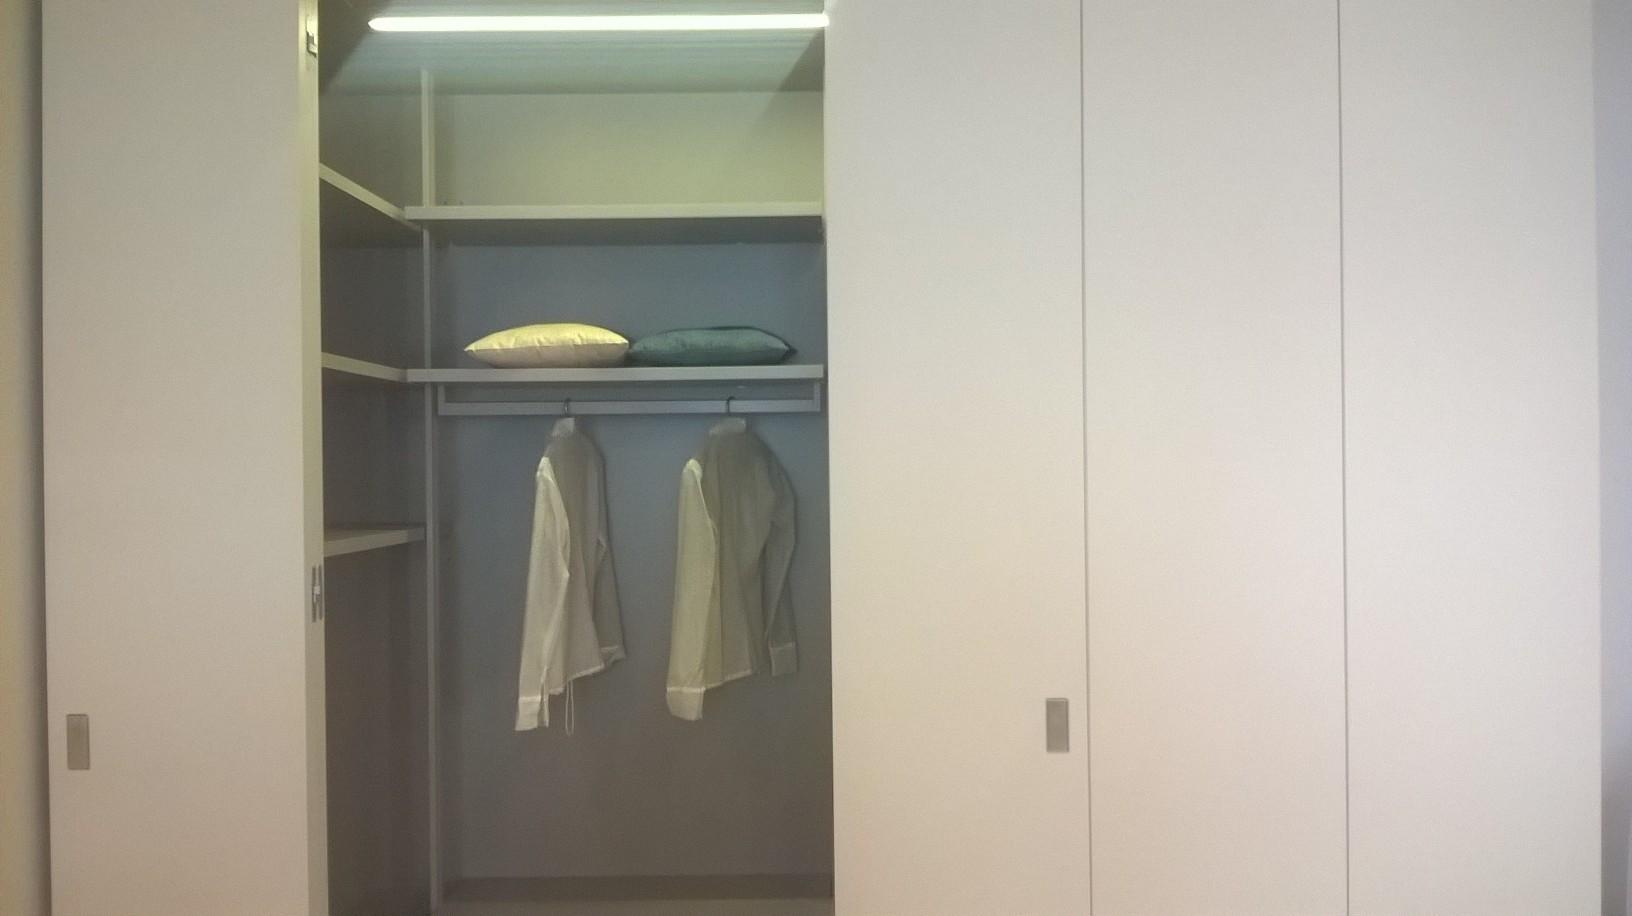 Caccaro cabina armadio 28 images cabina armadio for Cabina del biscotto di marthastewart com